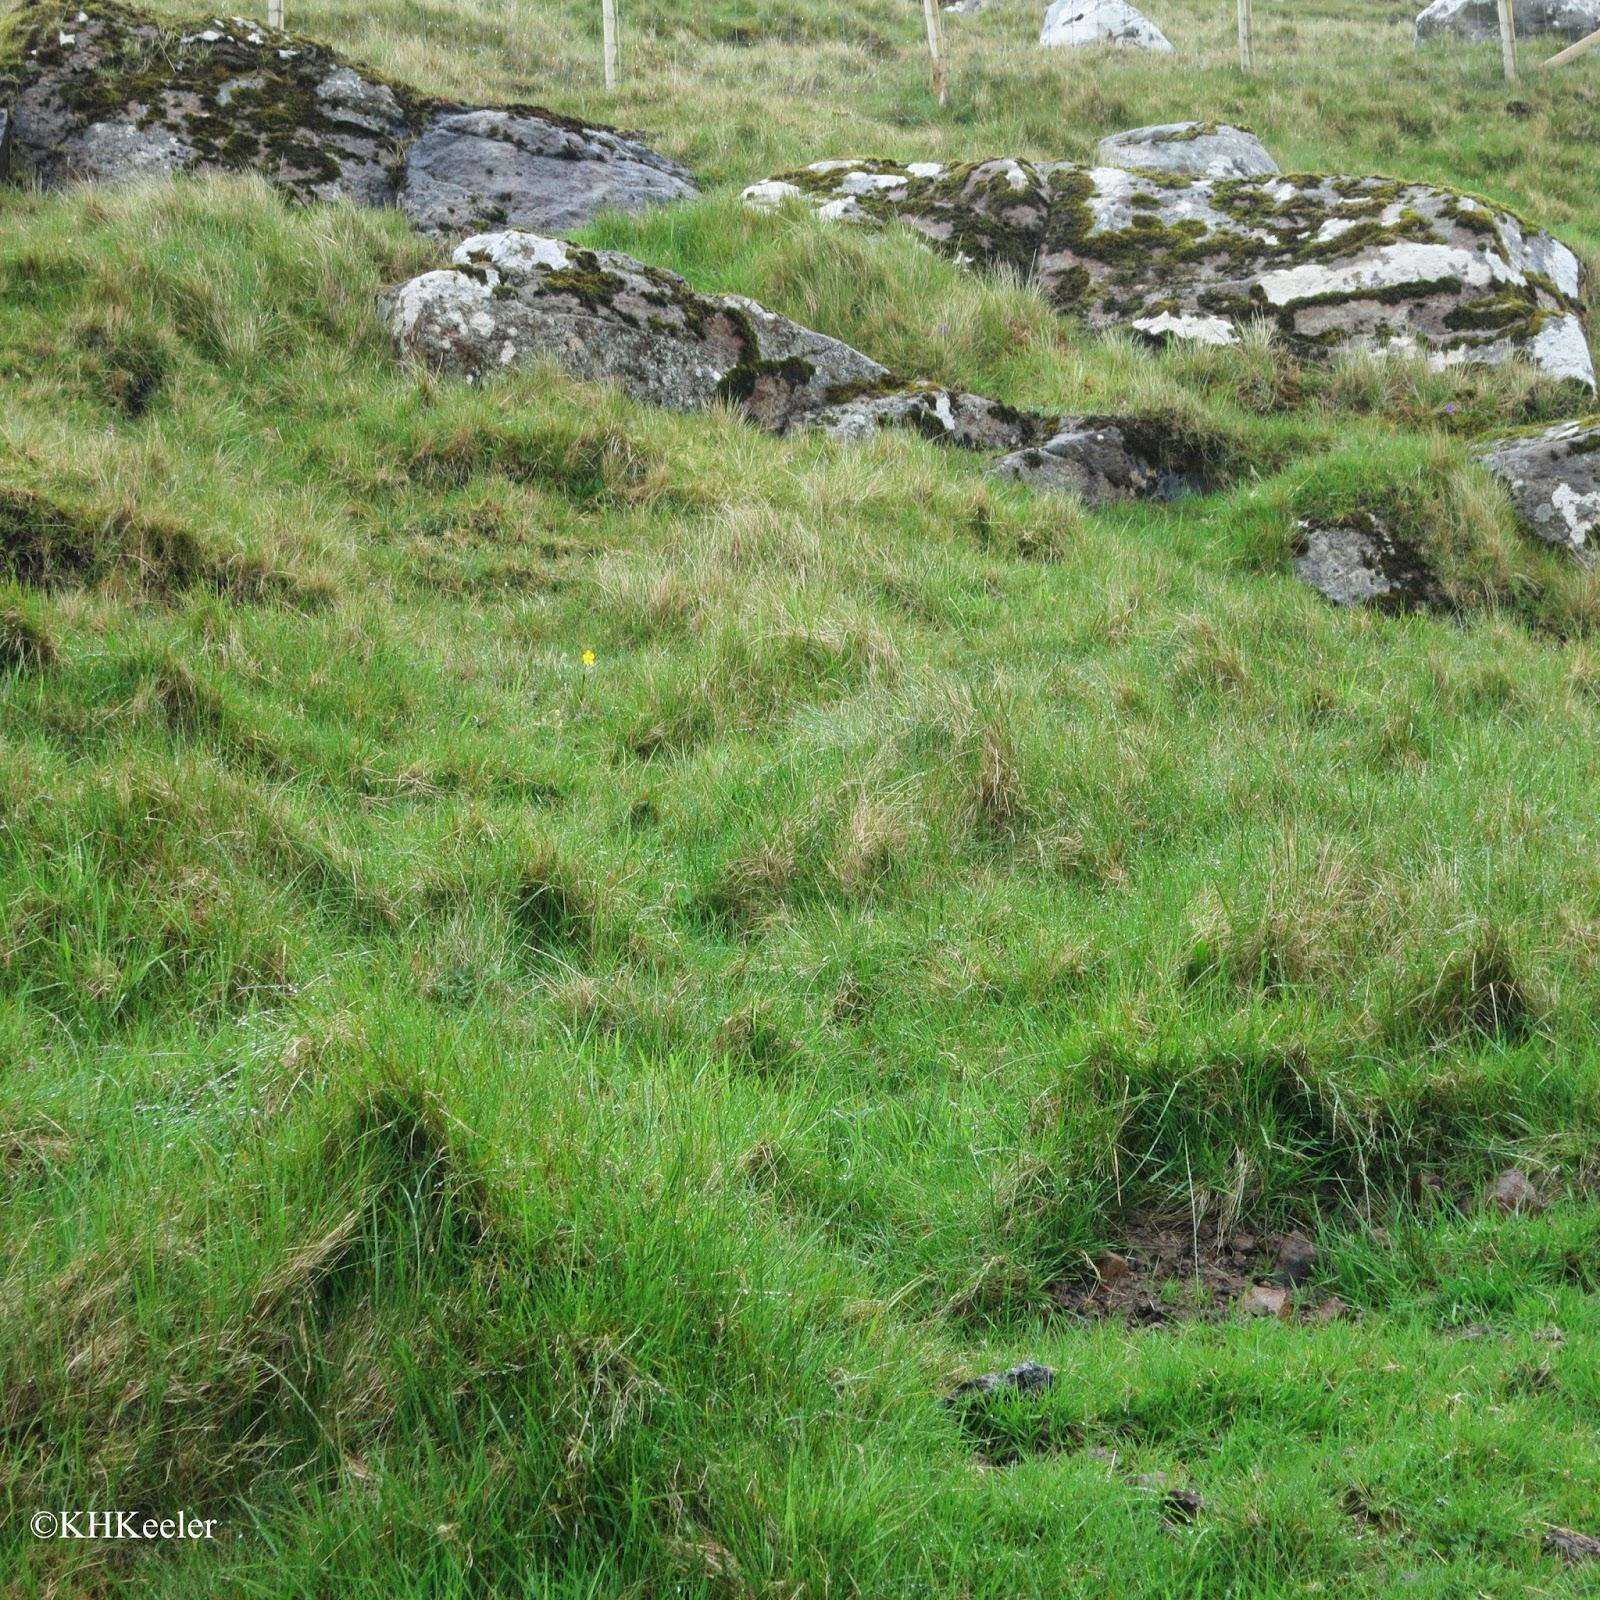 grassy hillside, Faroe Islands